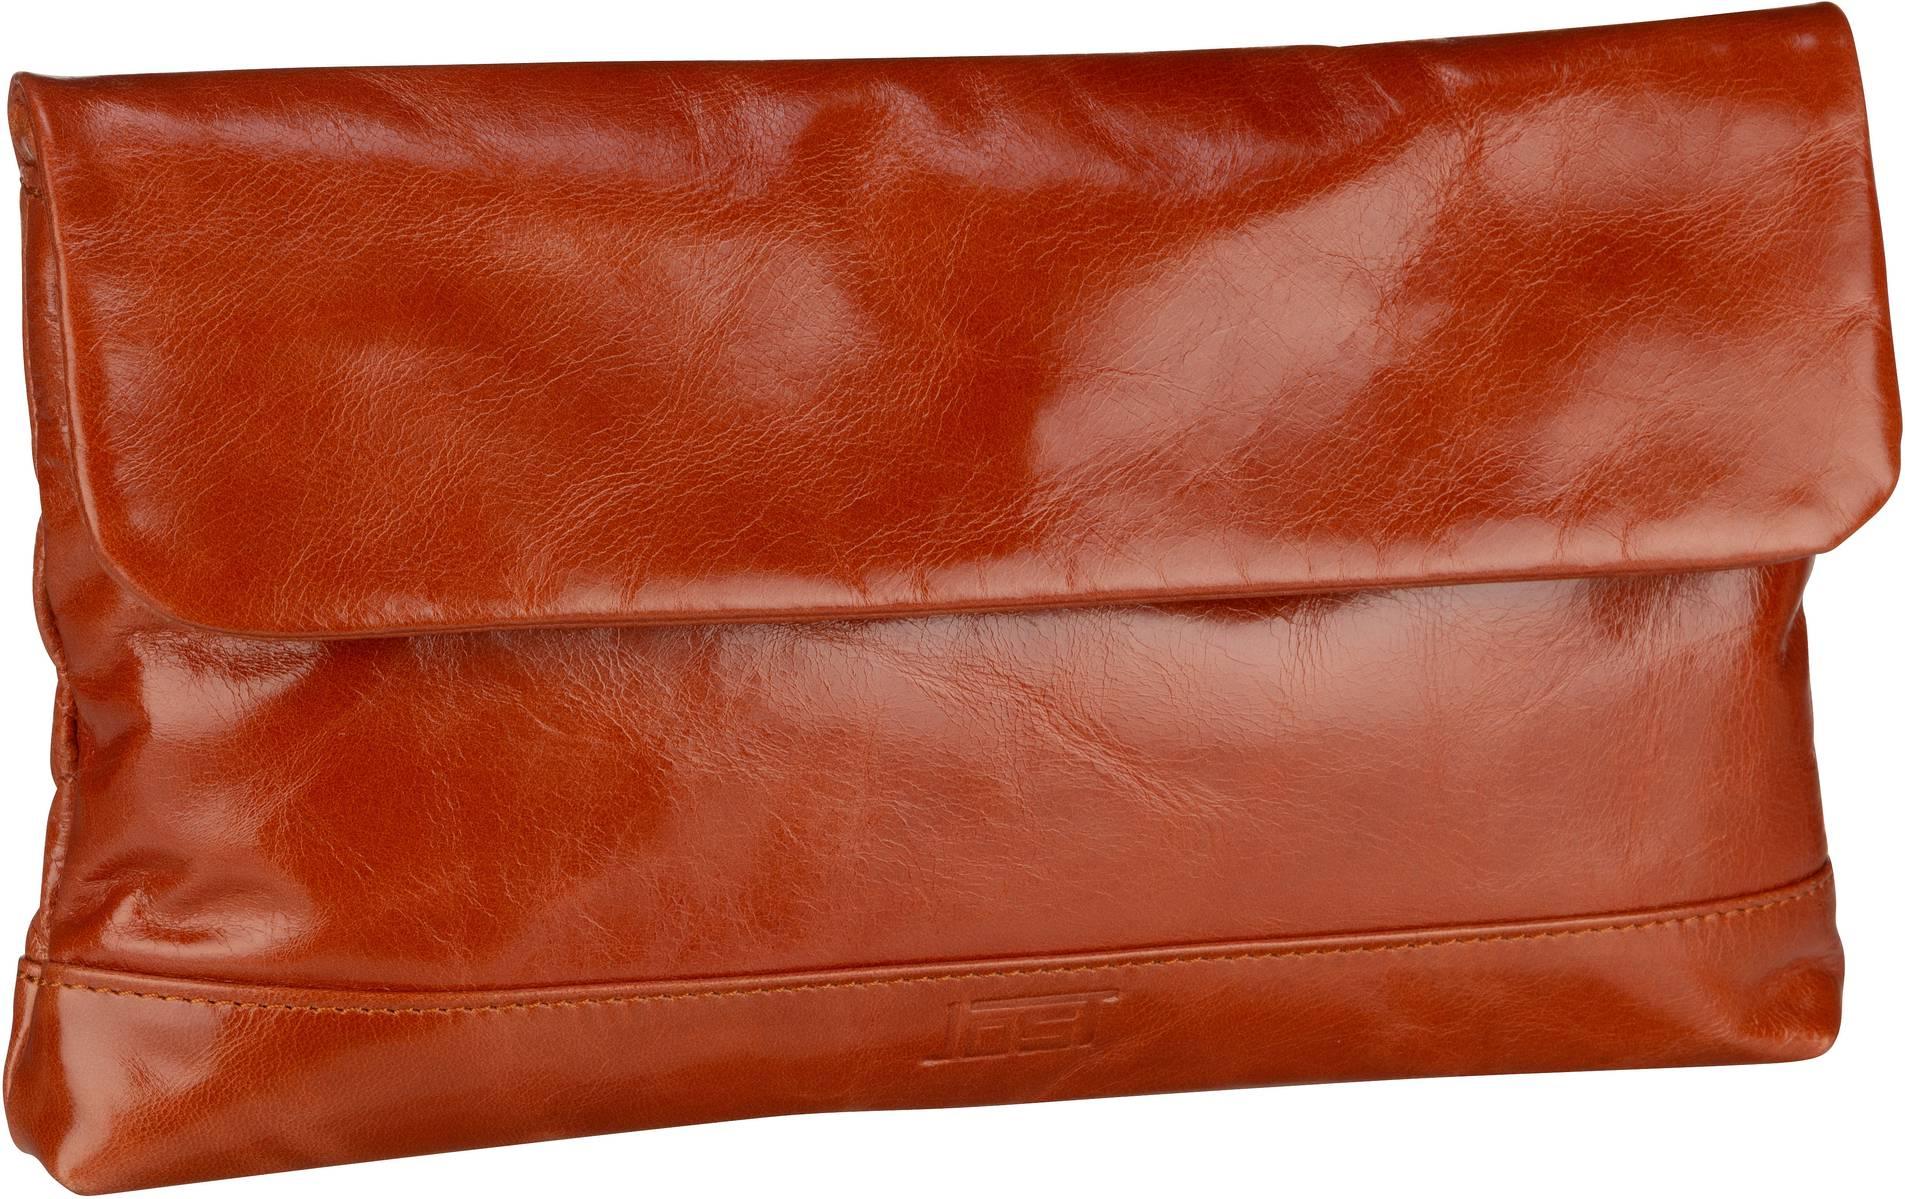 Handtasche Boda 6620 Clutch k